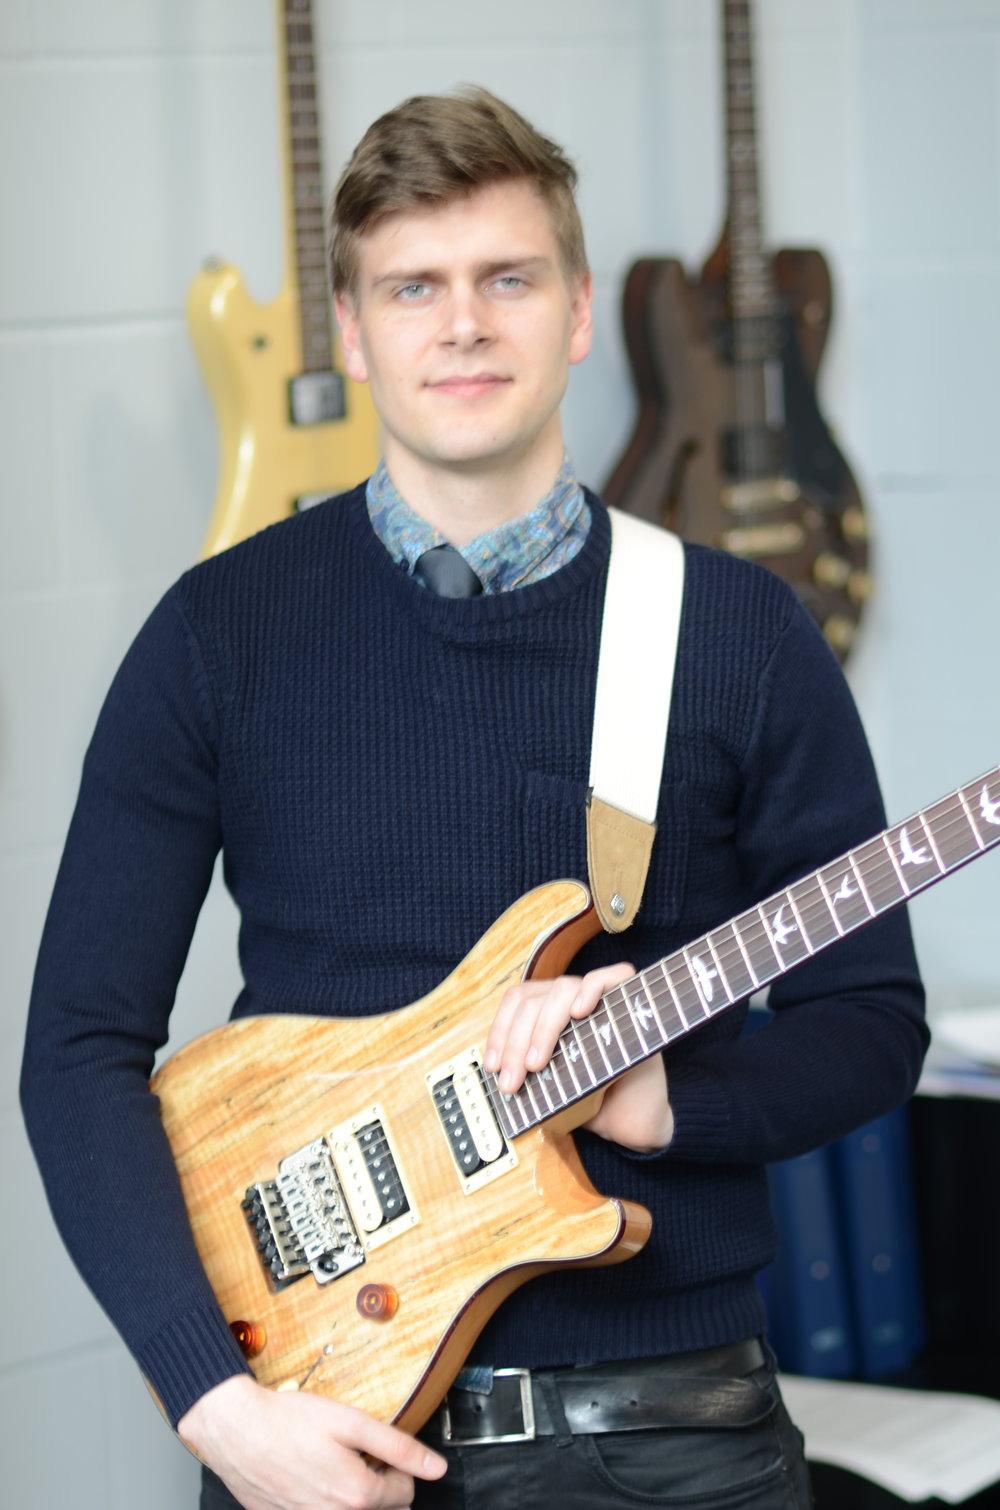 Darryl, Teacher at Guitar Tuition East London